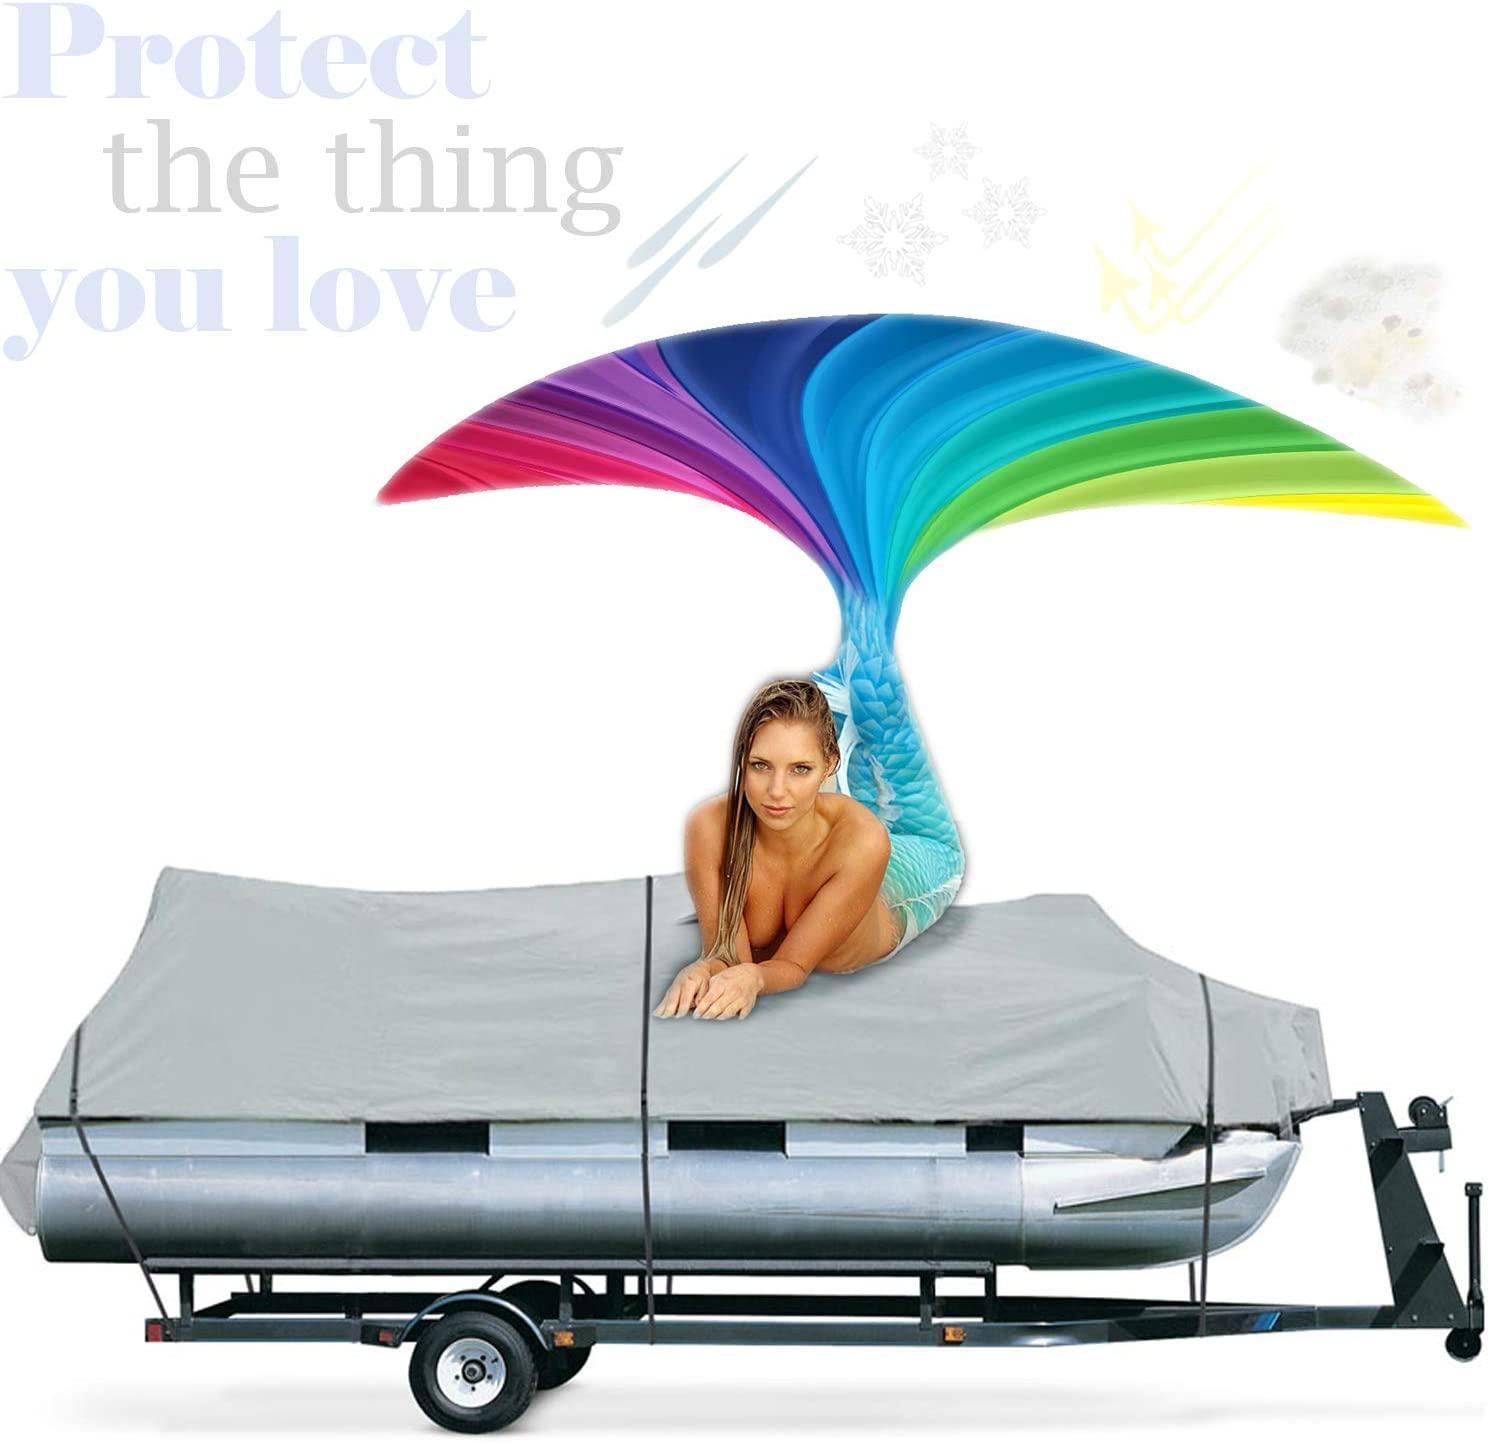 Increase Your Pontoon Boats Lifetime With Waterproof 18-20' Pontoon Boat Cover Trailerable Portable Marine Heavy Duty Mildew, Dirt, UV Resistant Weatherproof Fishing Canvas+European Cream 4 Men+E-Book